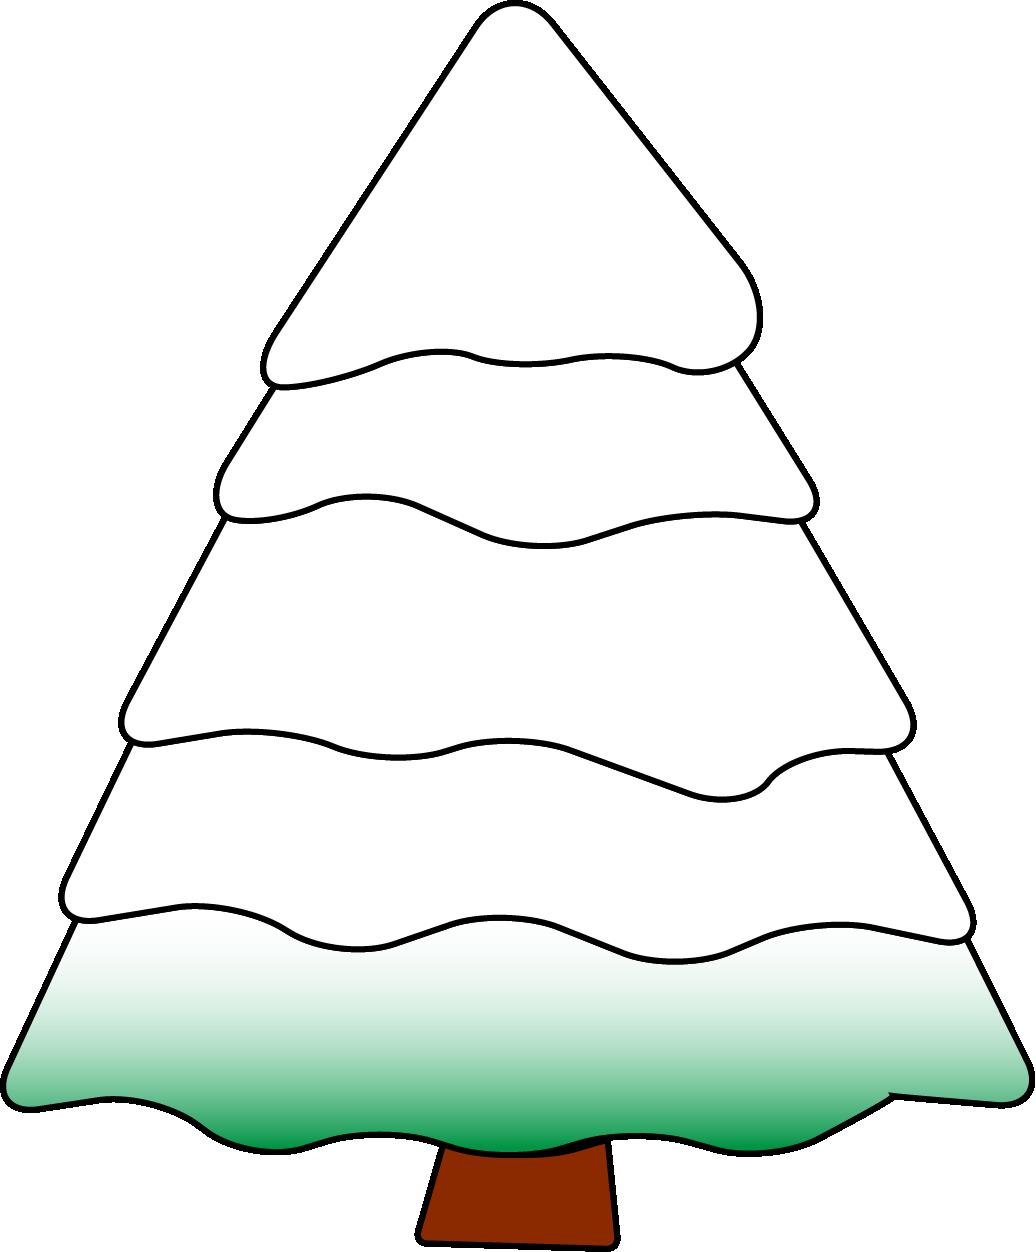 Fill the tree